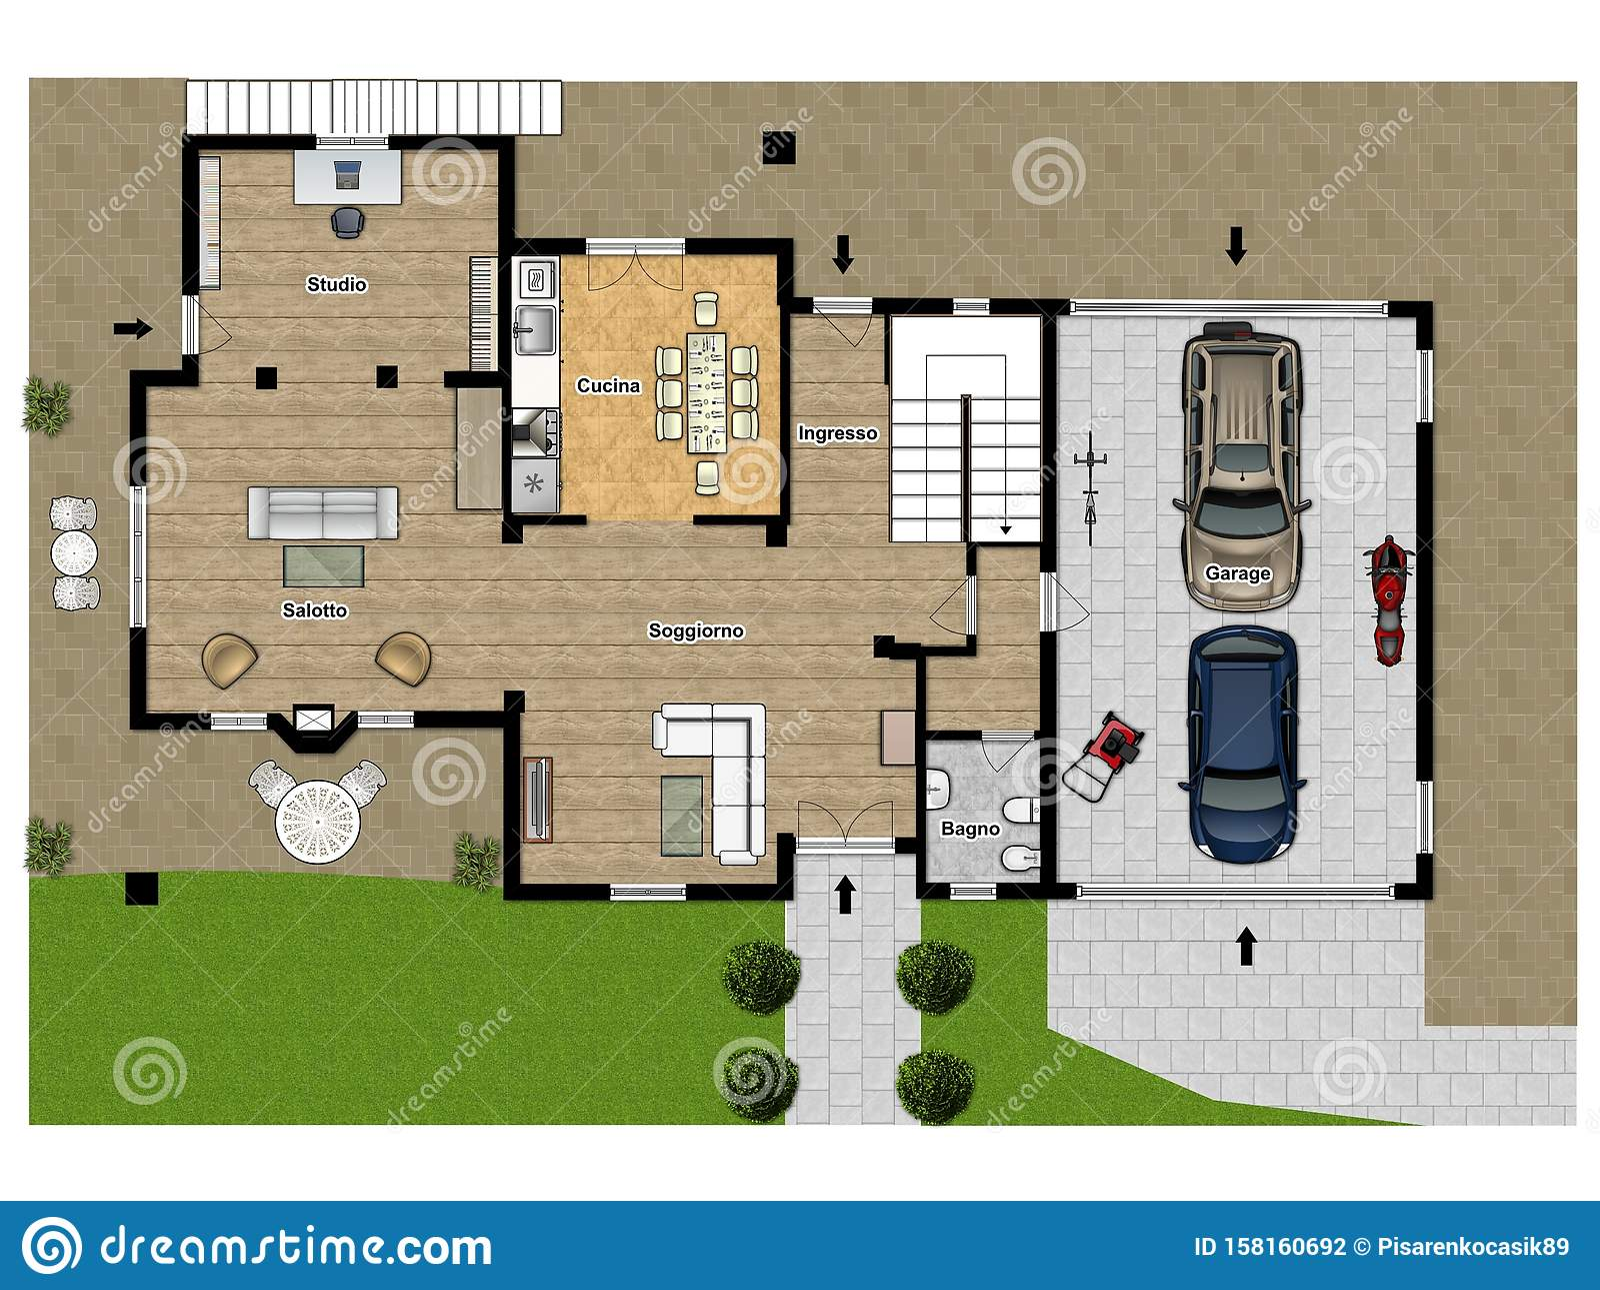 Floor Plan Color Floor Plans 2d 2d Illustration Floor Plan Stock Photo Image Of Floorplan Autocad 158160692